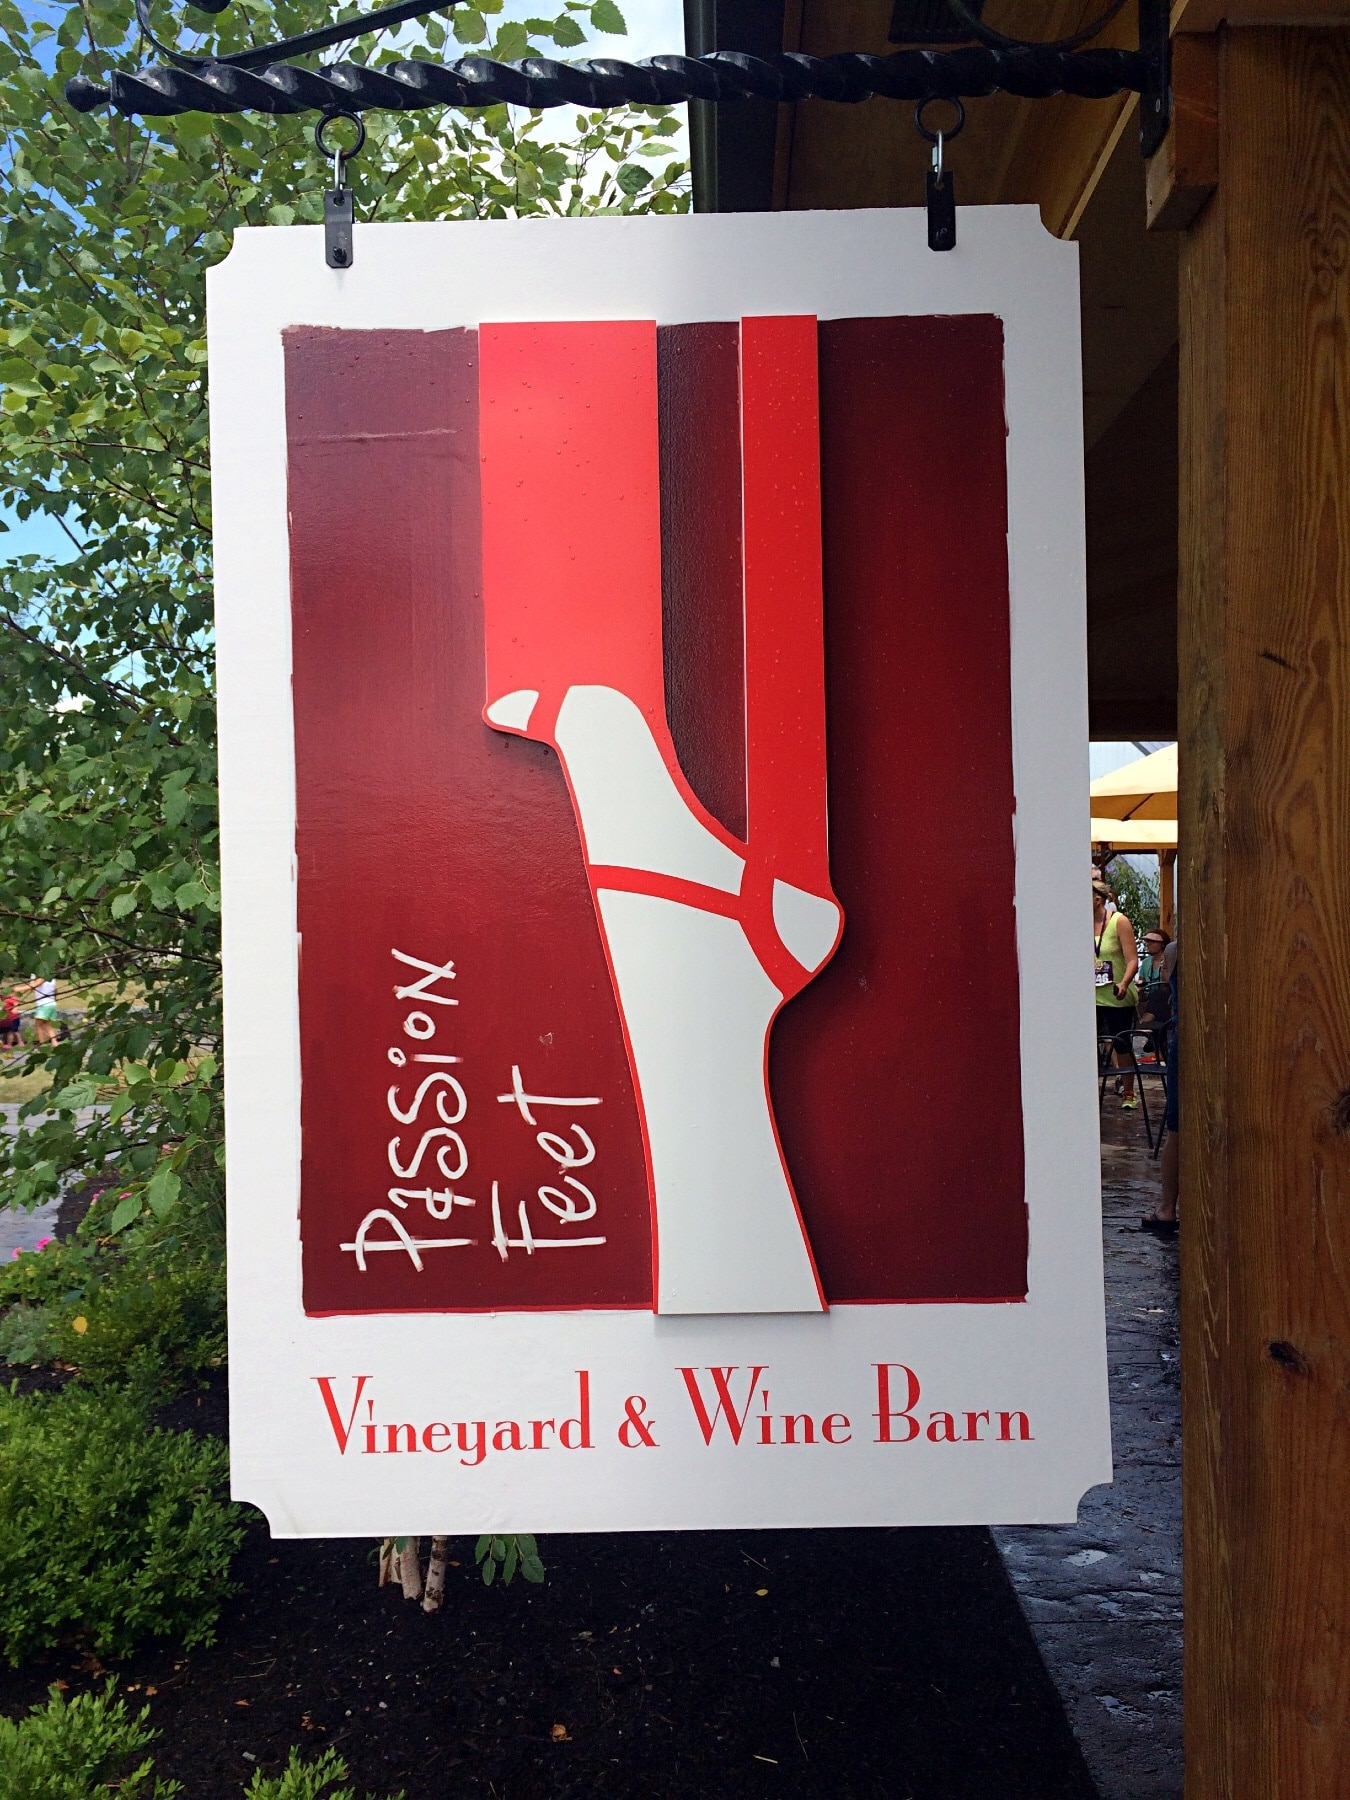 Three Brothers Wineries and Estates, Geneva, New York, United States of America